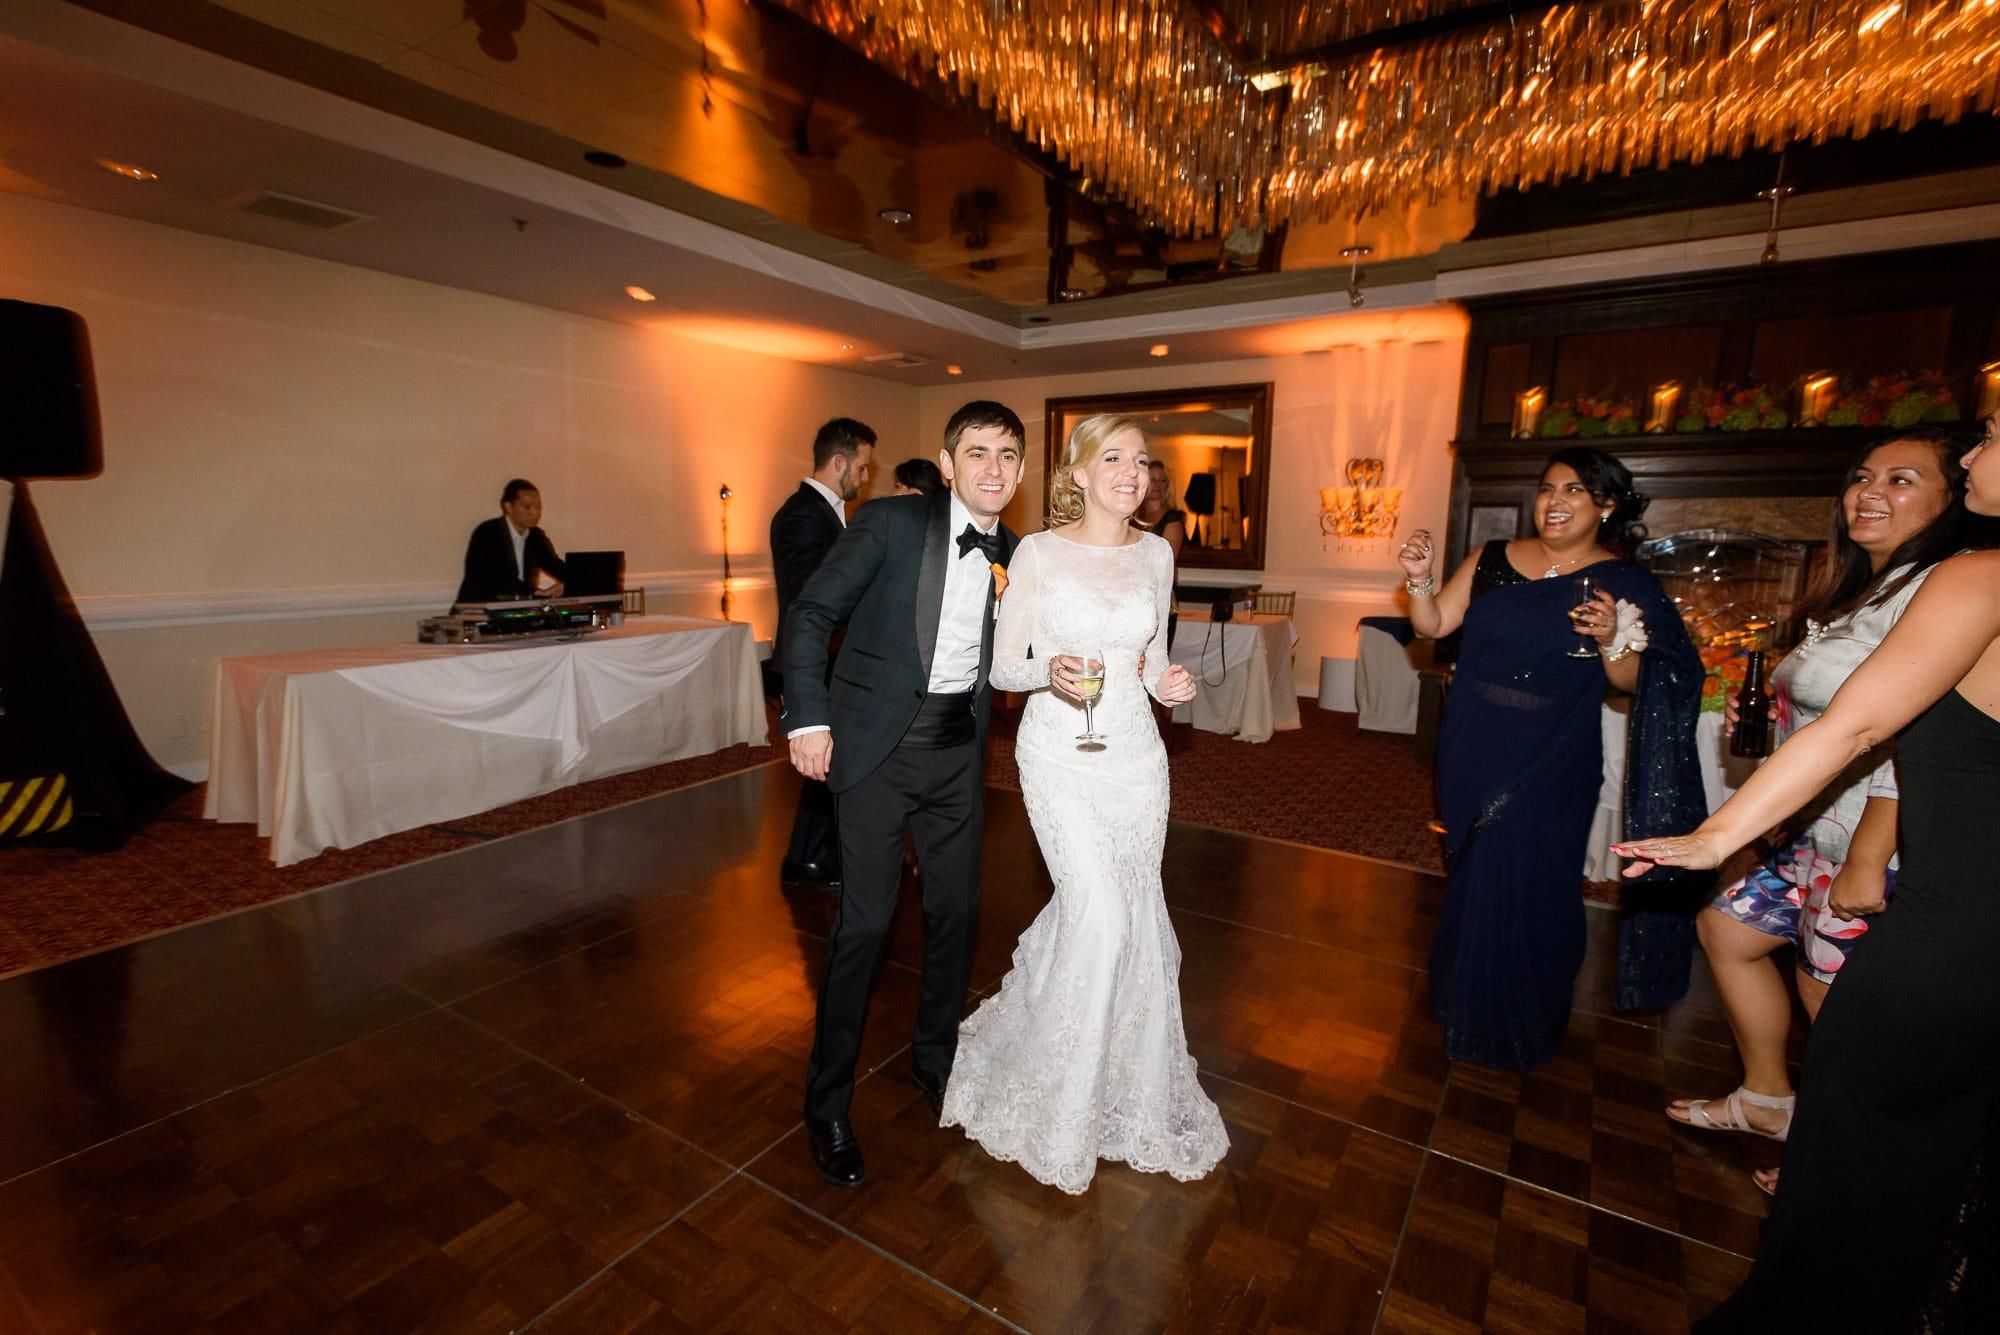 076_Alan_and_Heidi_Los_Angeles_Equestrian_Center_Wedding